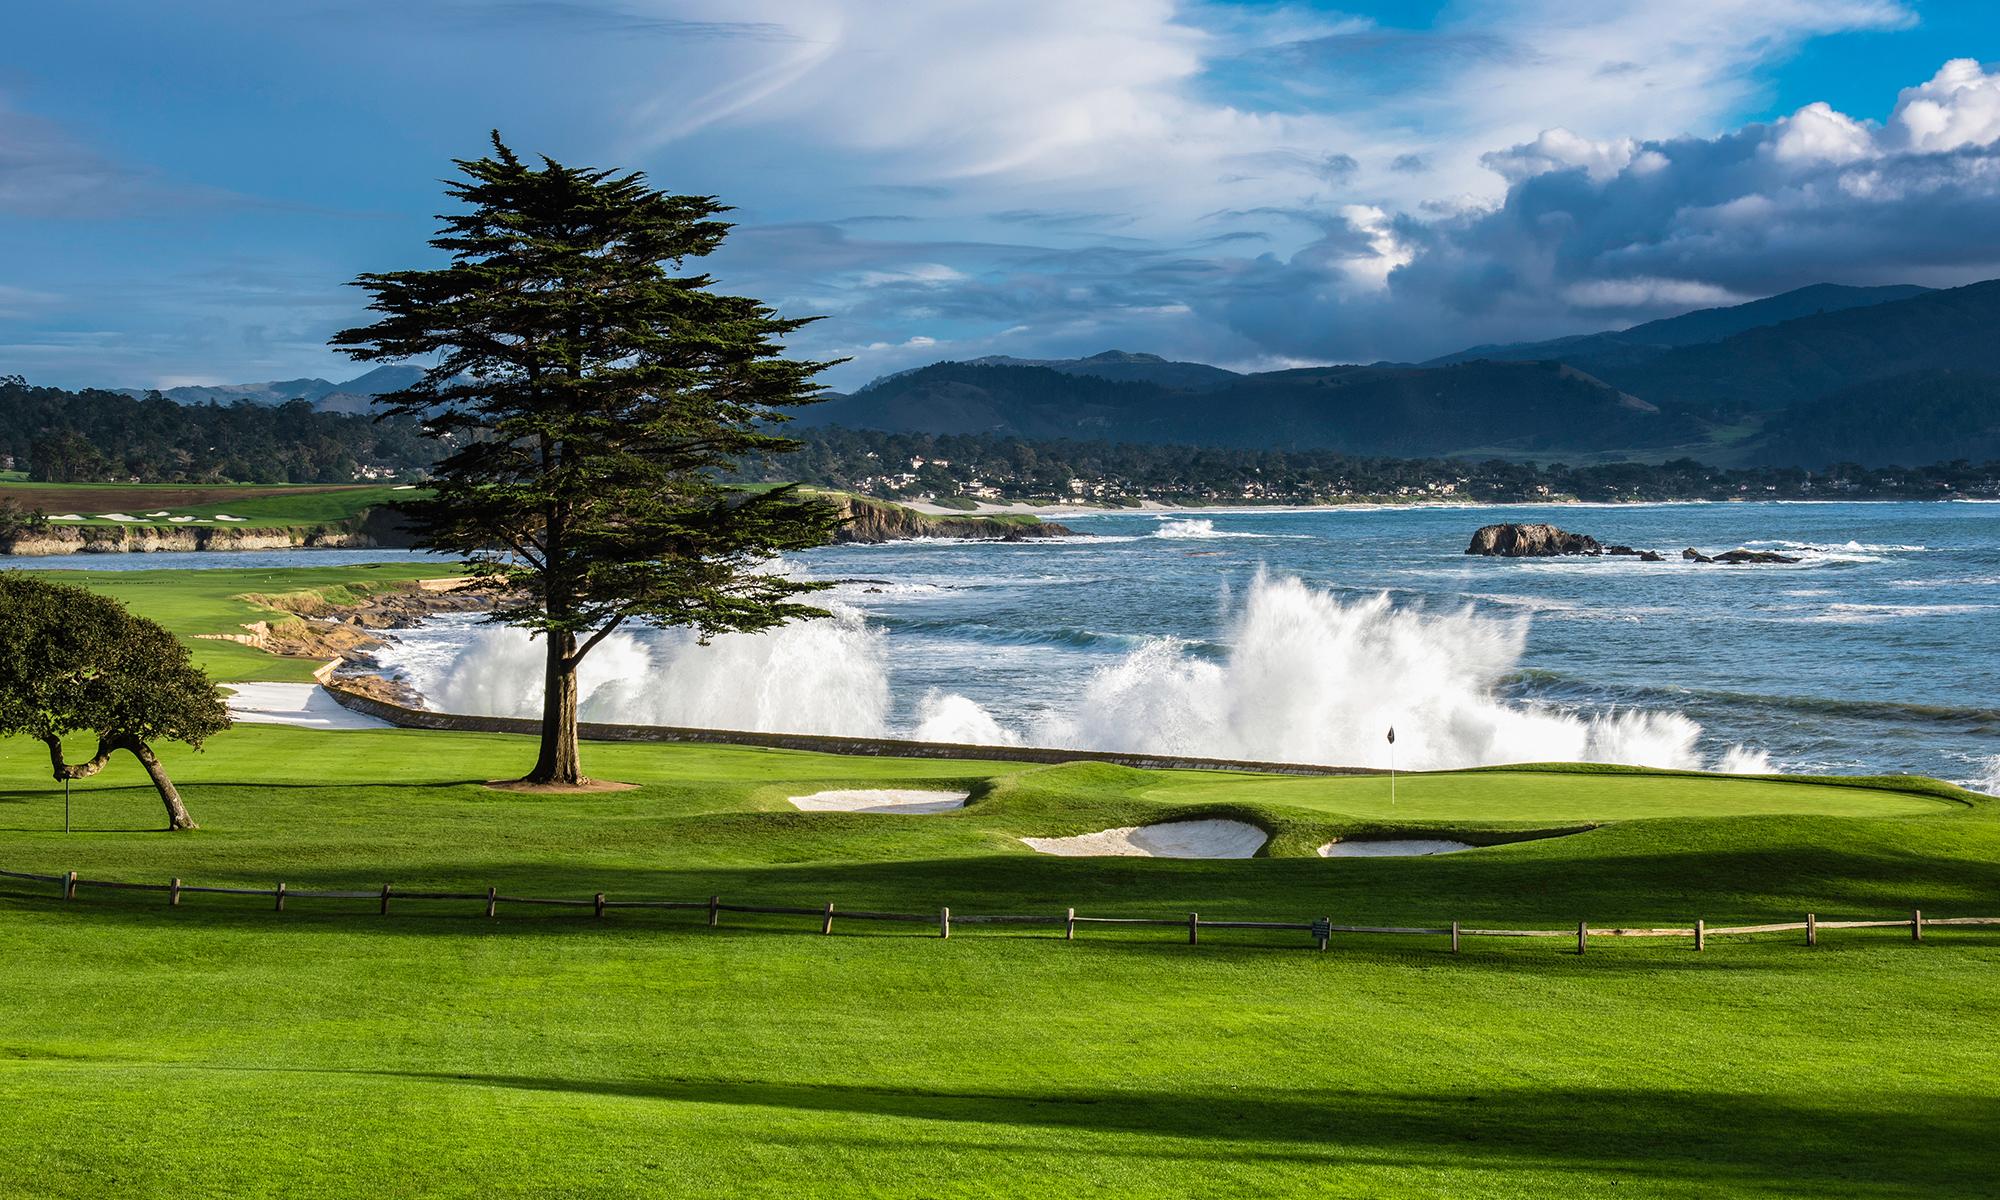 Golfing by the sea! Pebble Beach Golf Links, Carmel Bay, California, USA.